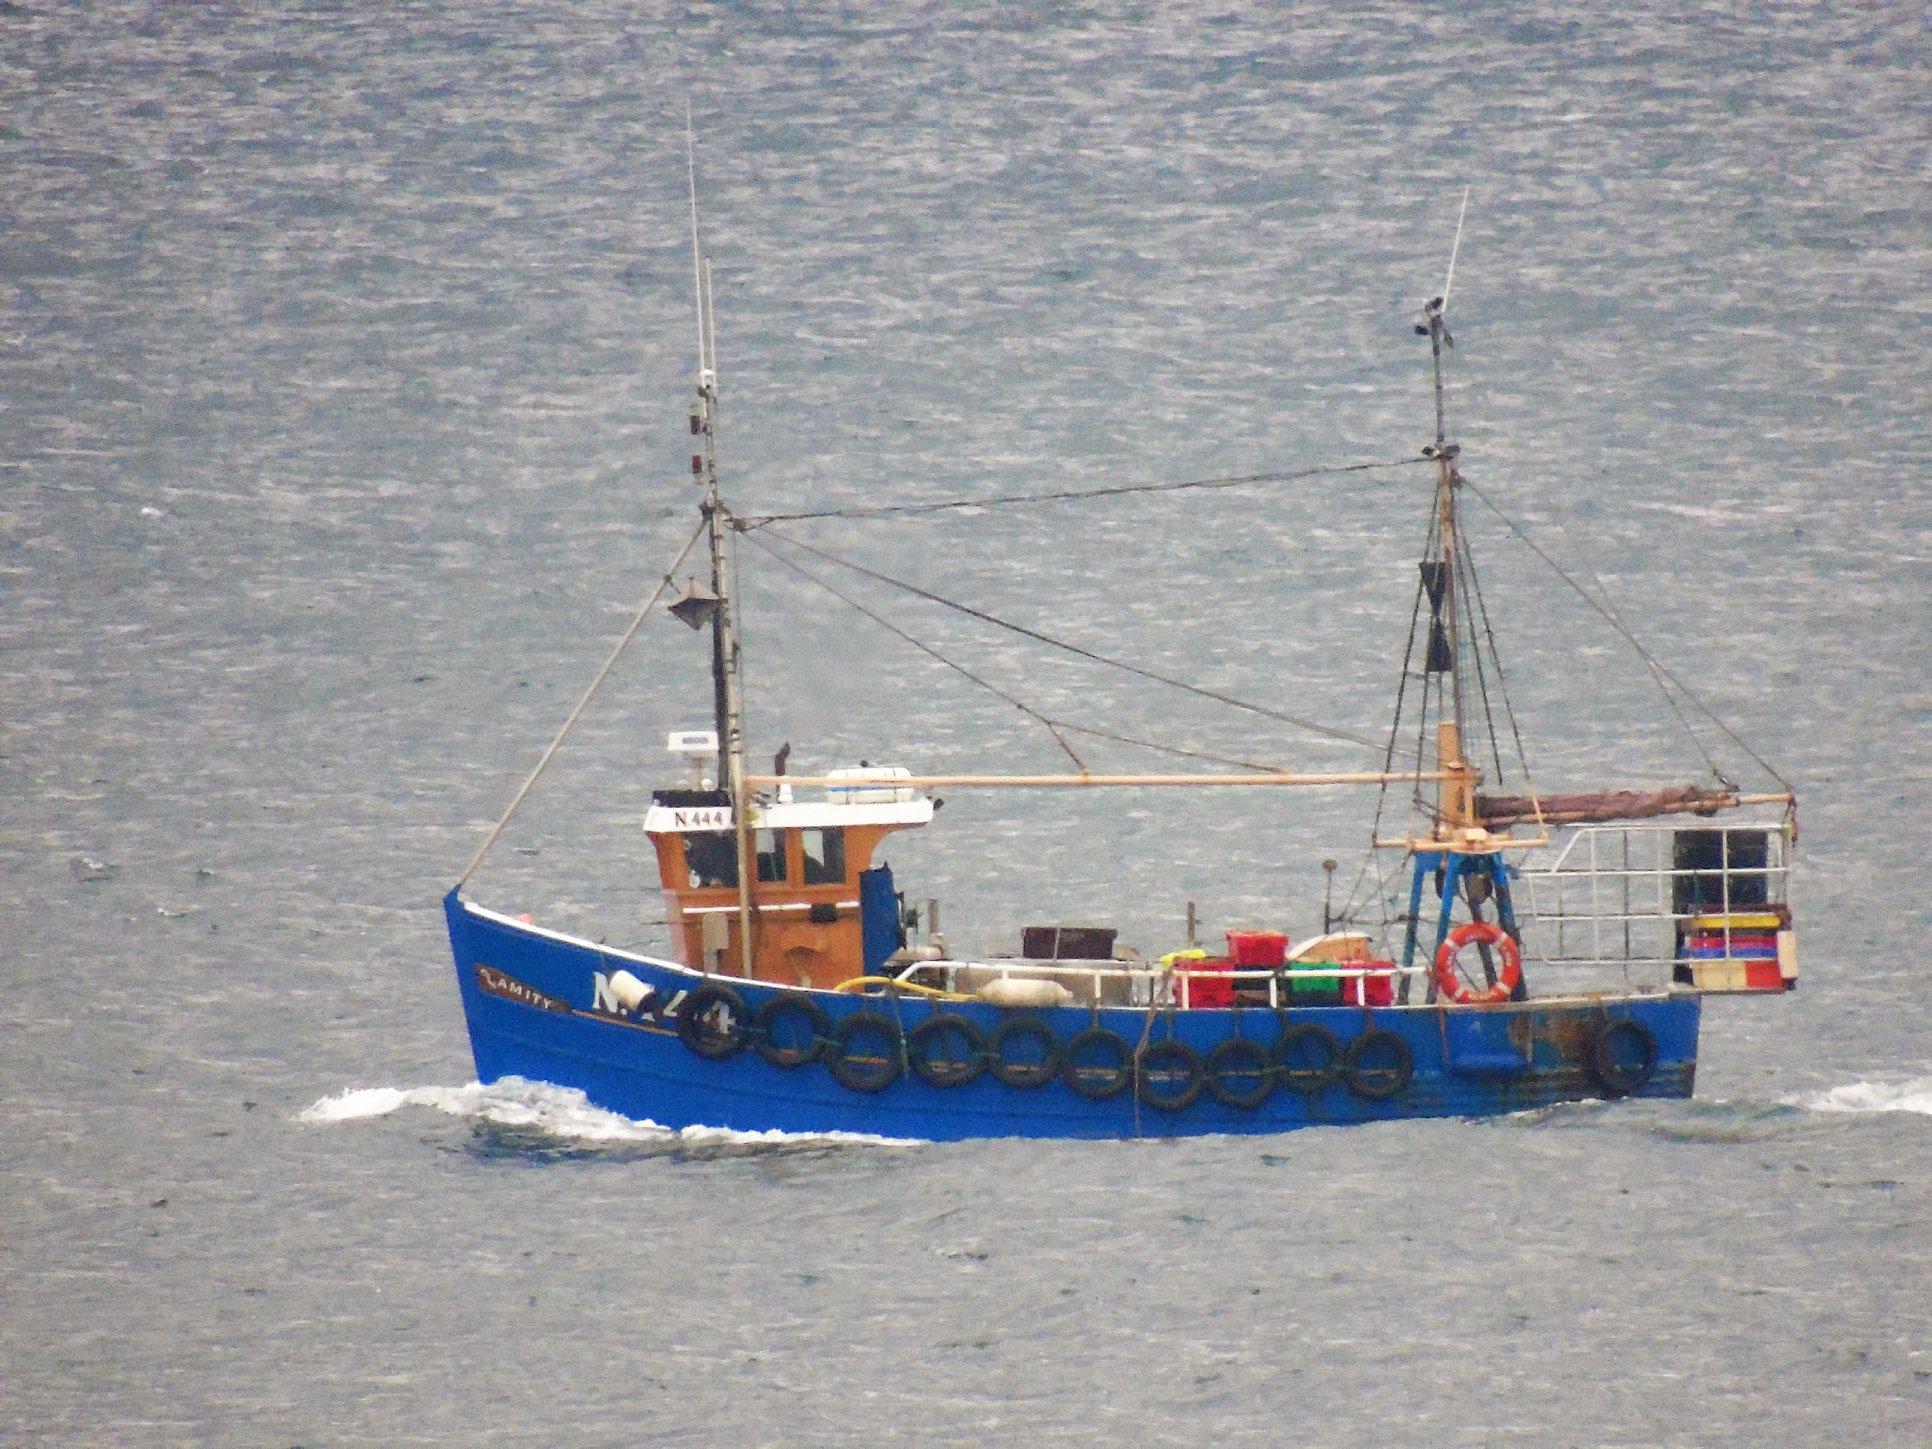 AMITY N444   Type: Crab/ Prawn Trawler  Size: 10.57m  Built: 1989; Portavogie